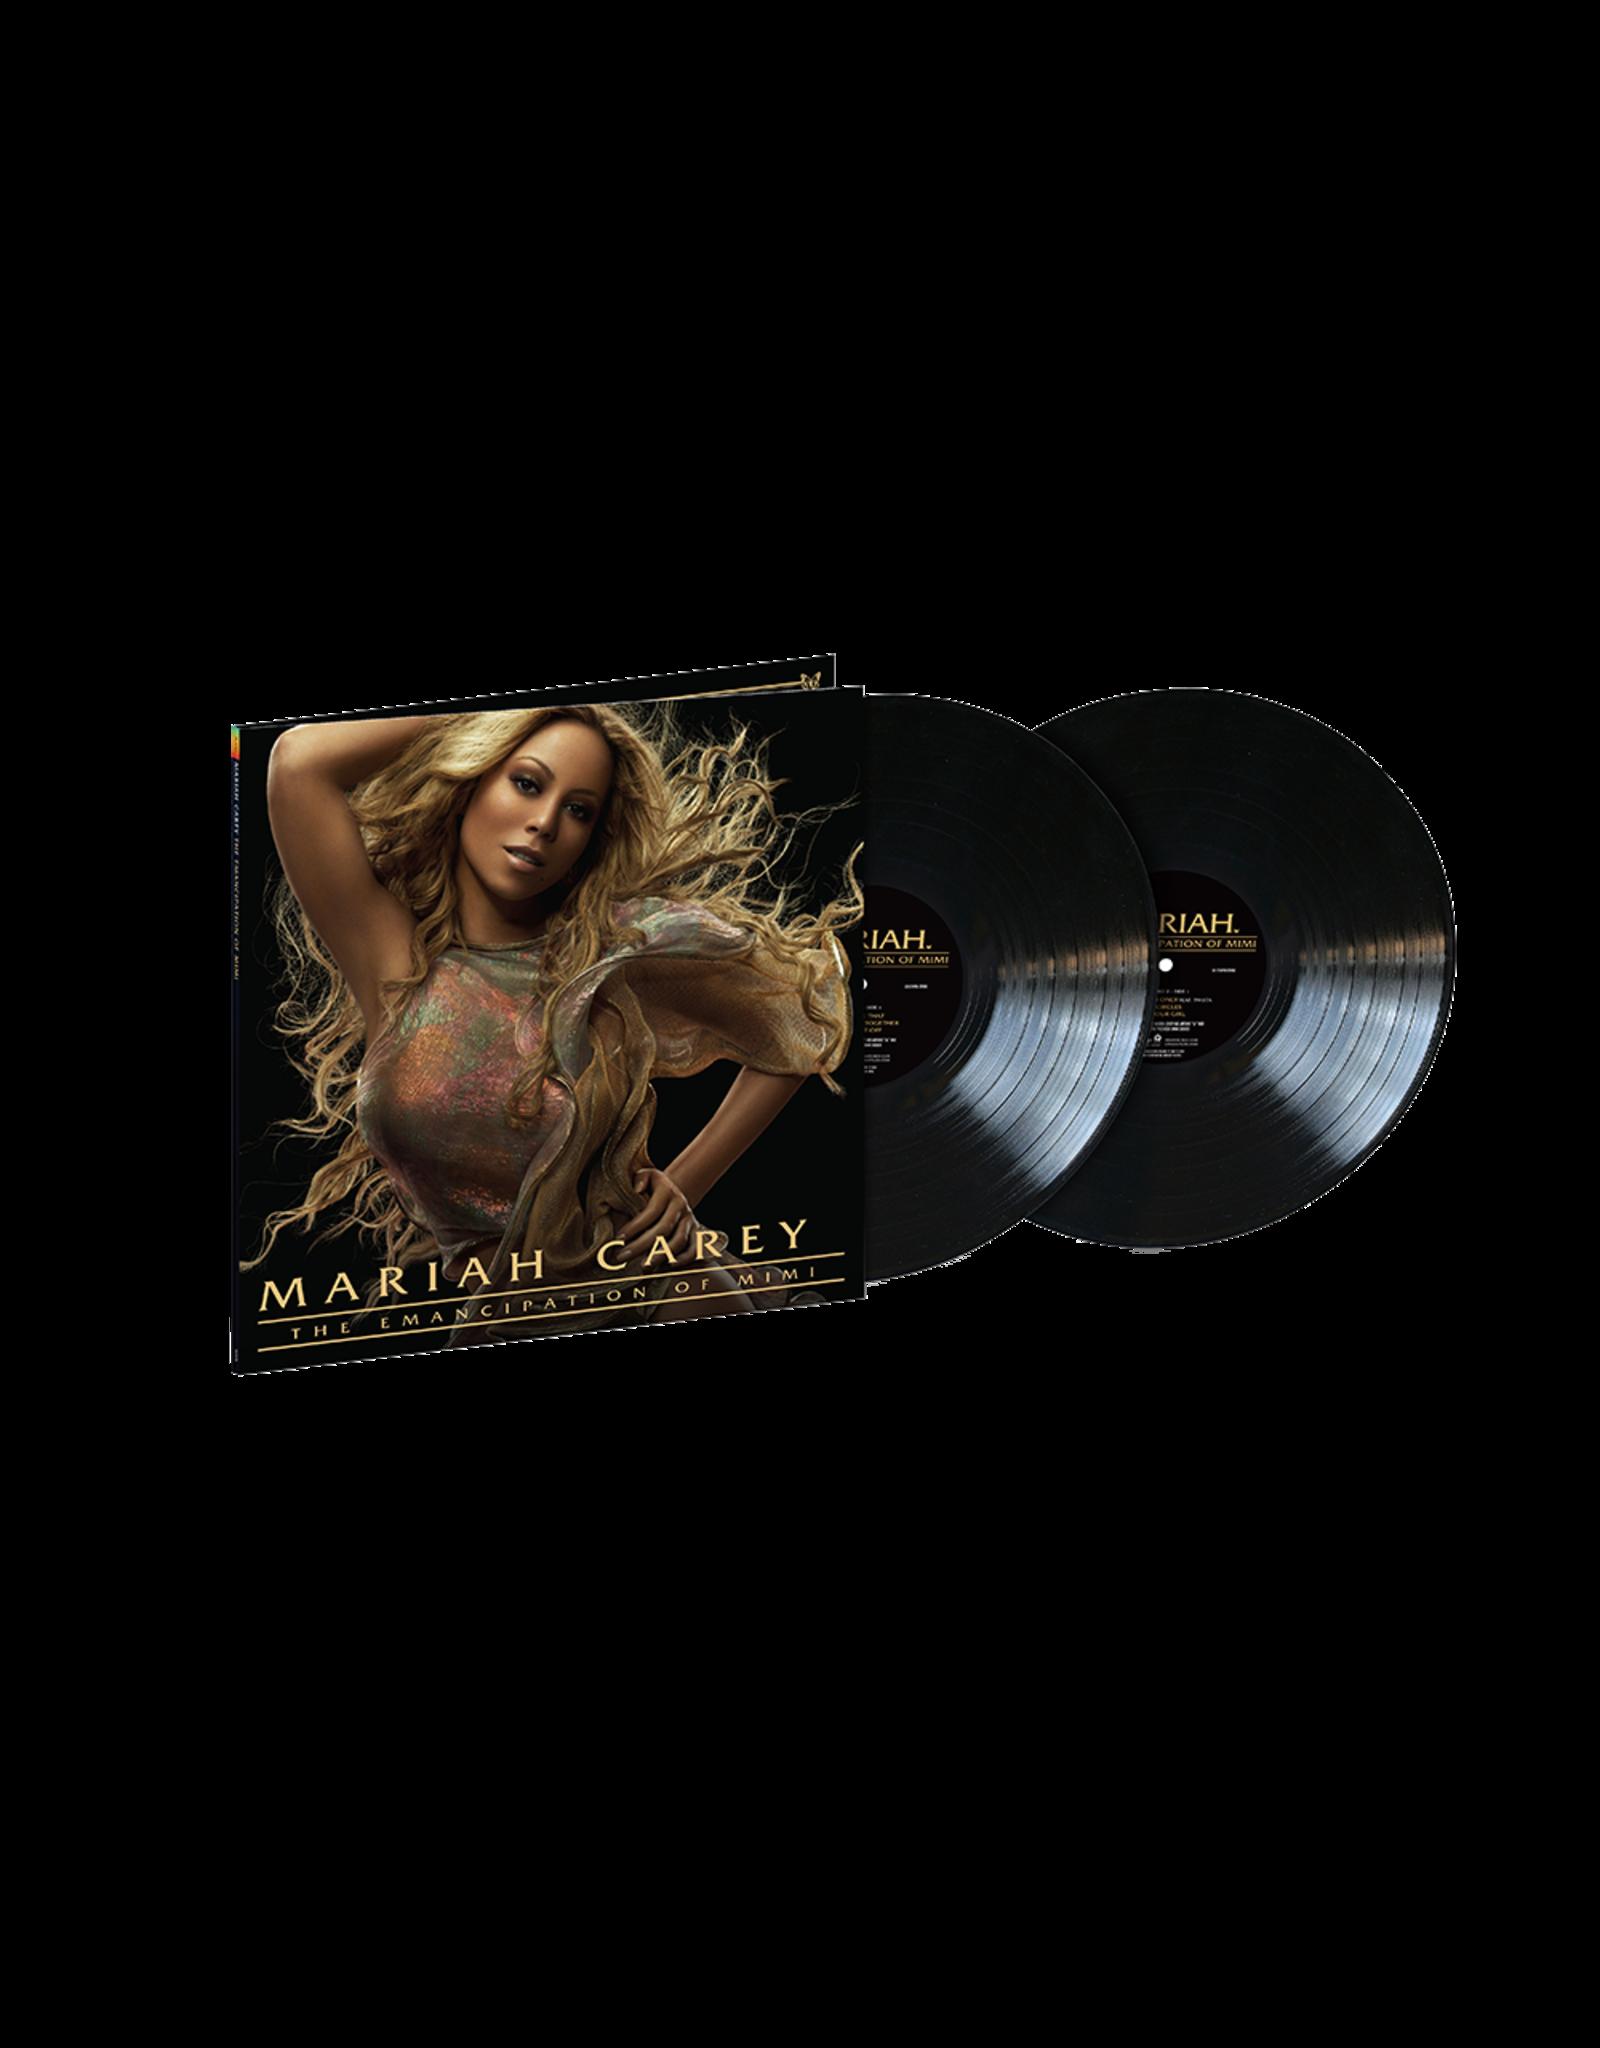 Mariah Carey - The Emancipation of Mimi (15th Anniversary Edition)